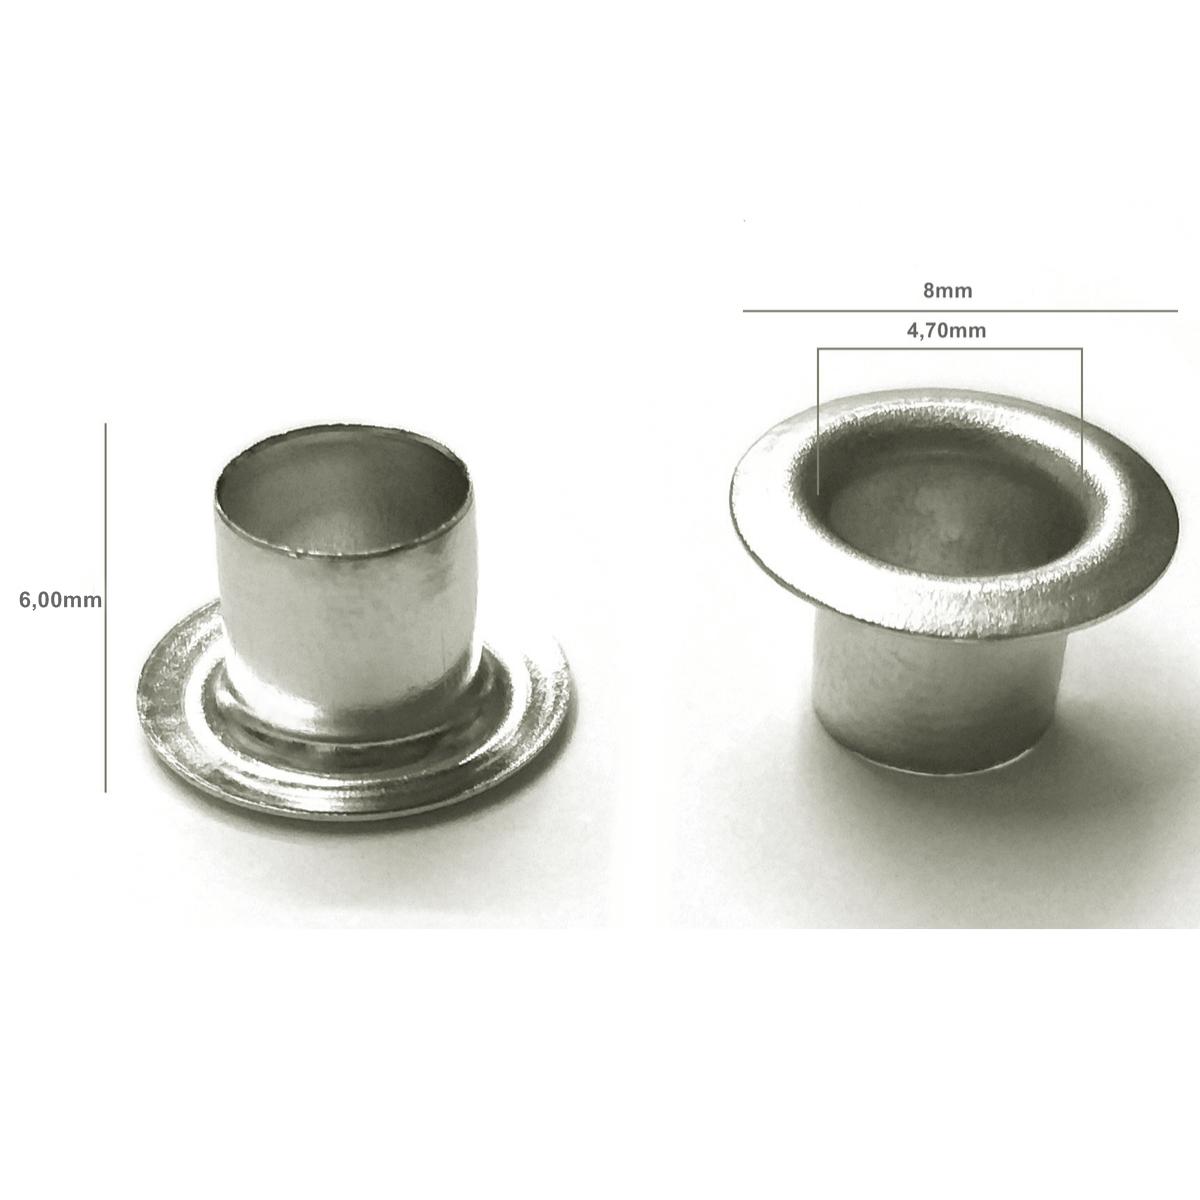 Ilhós Alumínio Prata com Aba Alta Nº 54 8mm de diâmetro externo